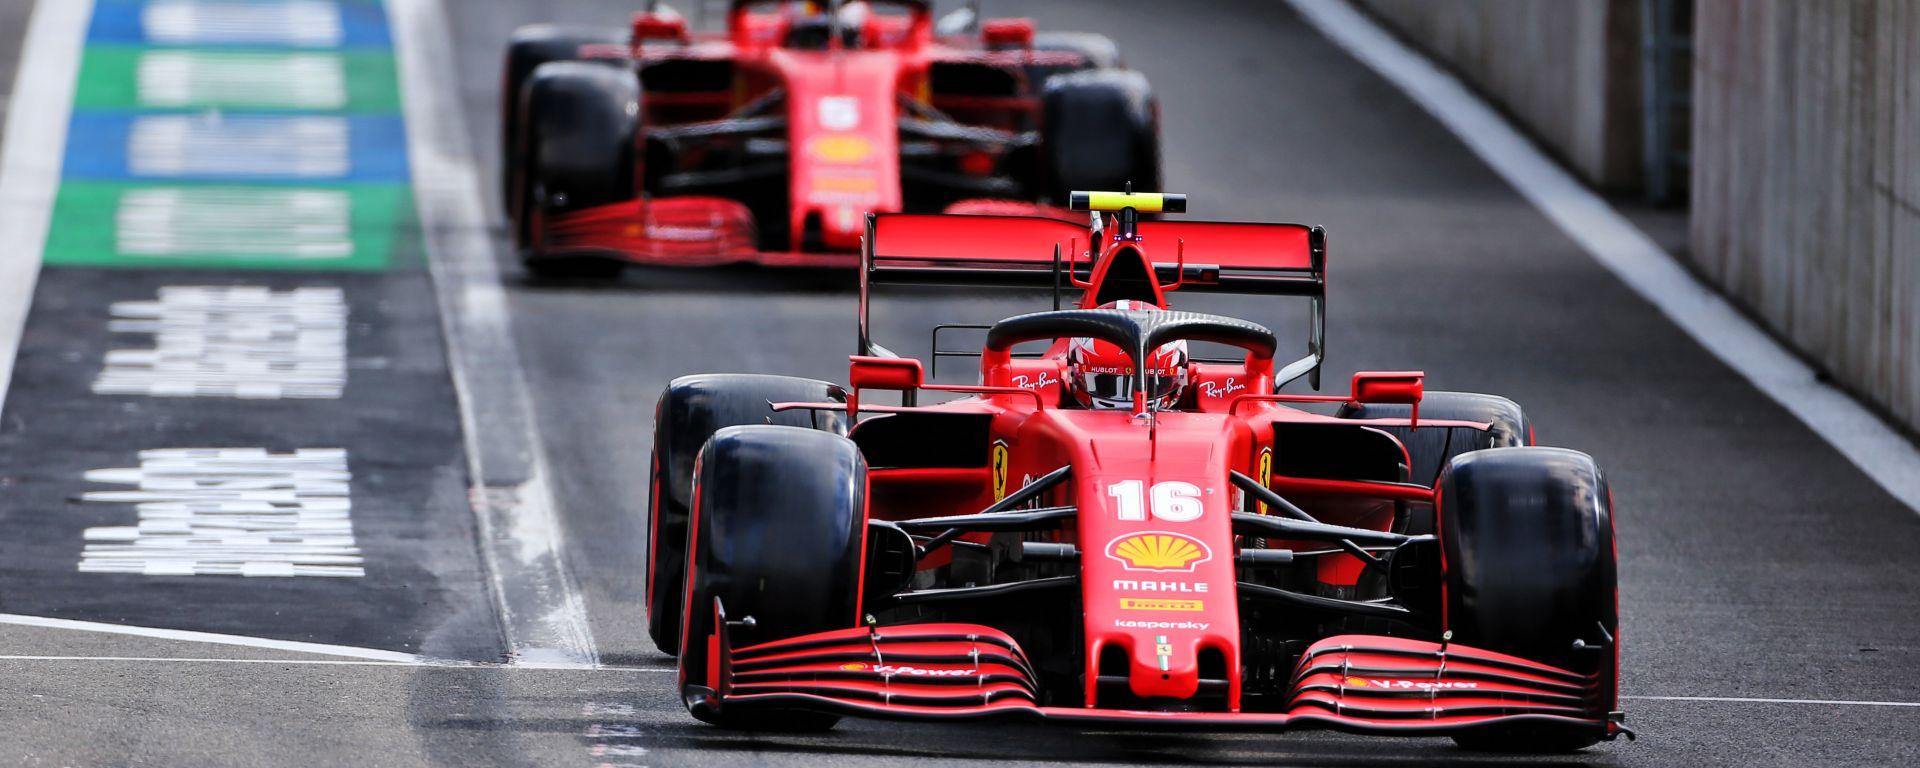 F1, GP Belgio 2020: le Ferrari di Charles Leclerc e Sebastian Vettel